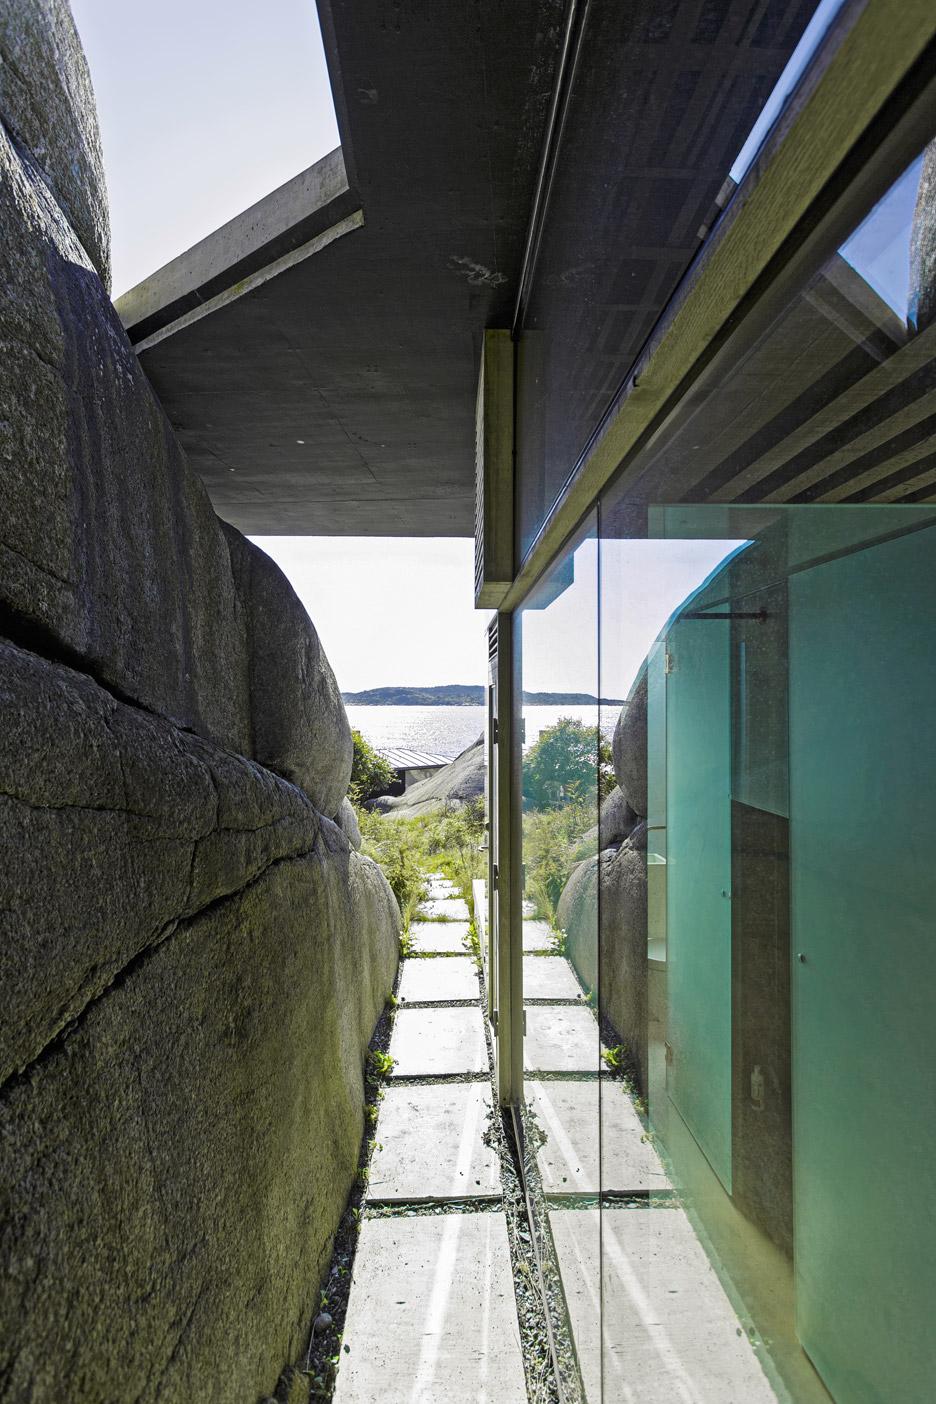 cabin-knapphullet-lund-hagem-kim-muller-photography-sandefjord-norway_dezeen_936_4